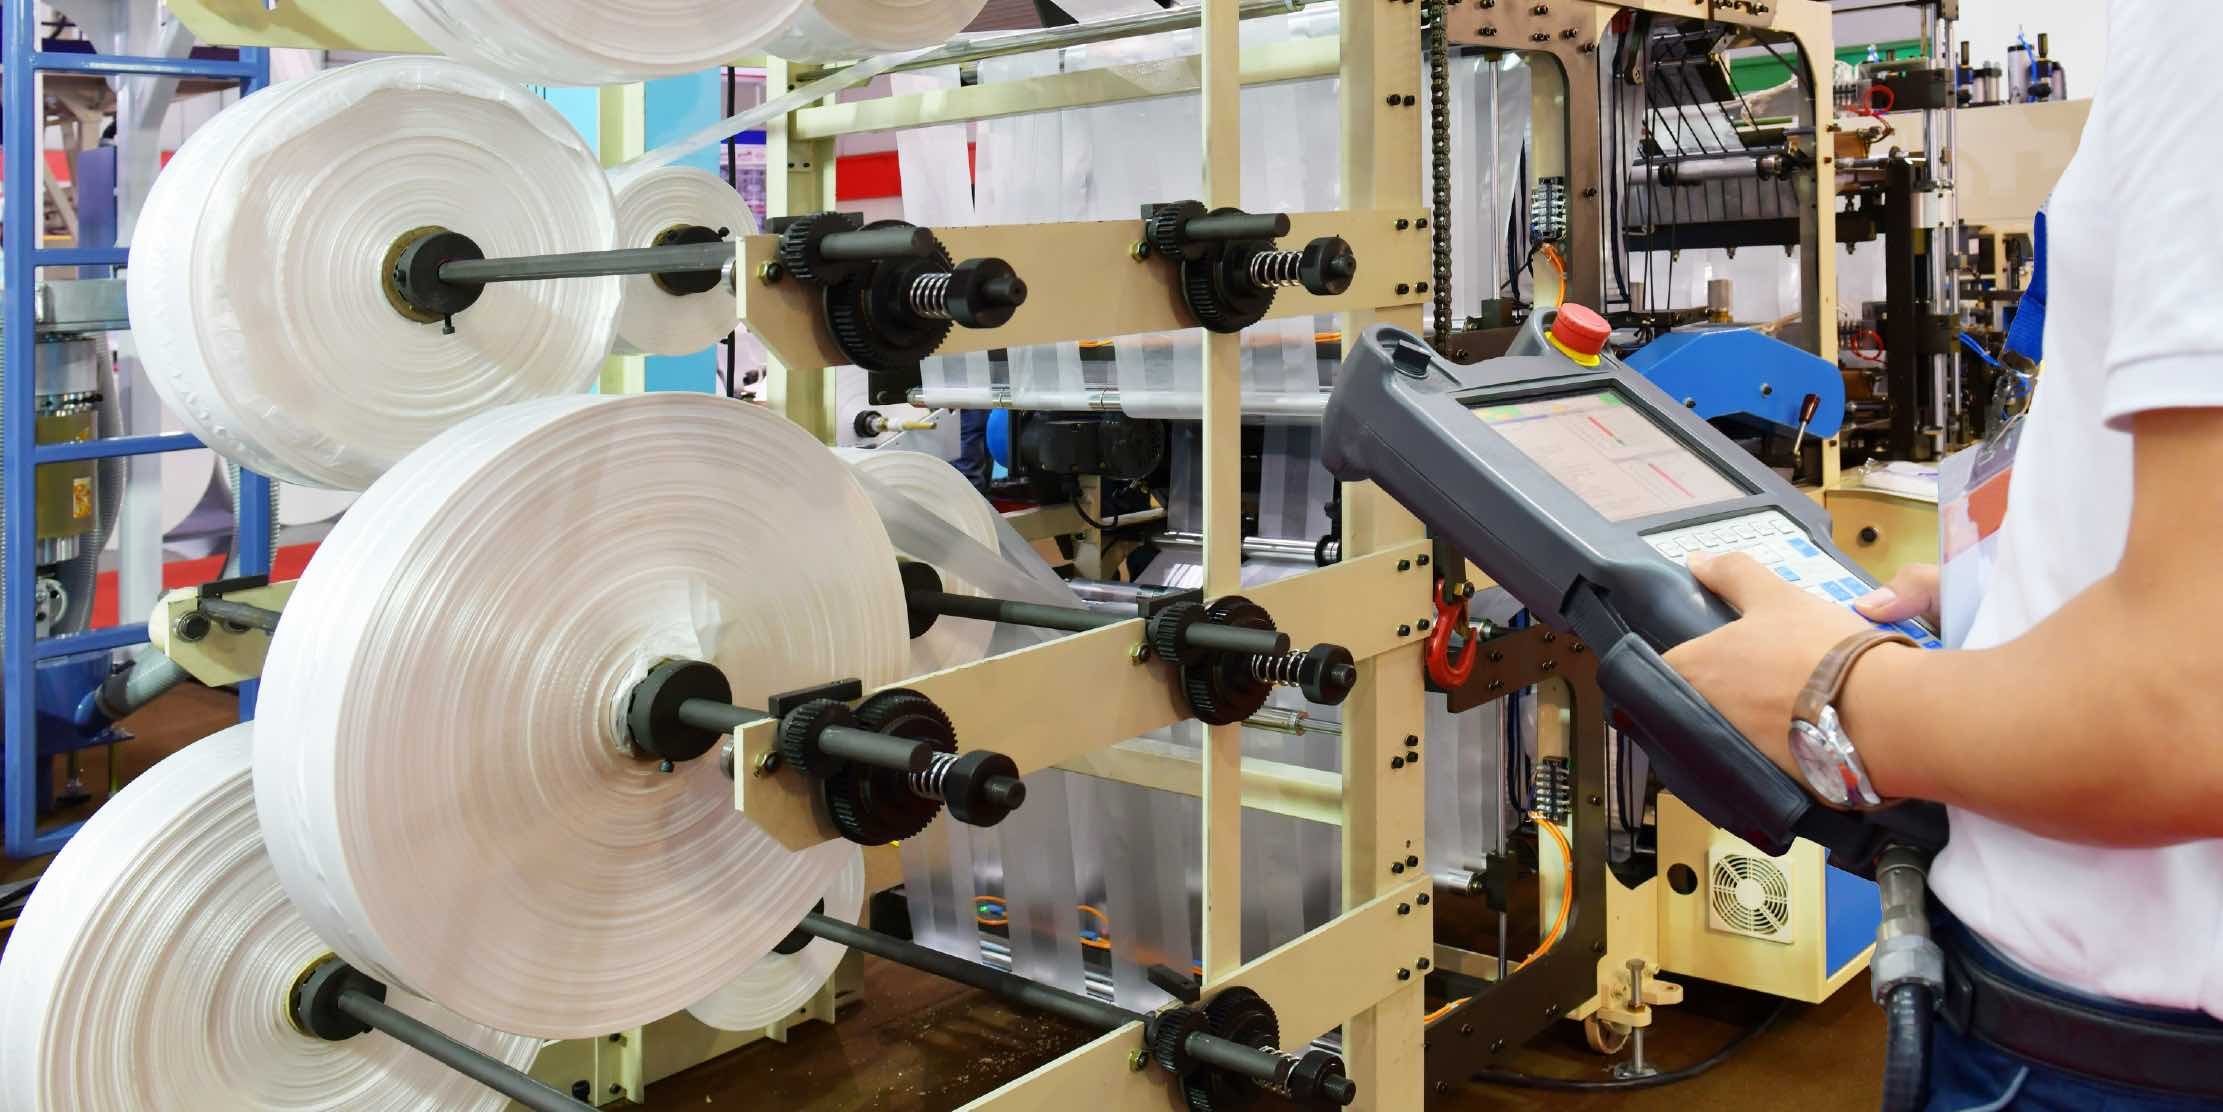 Interne logistik produktkontrolle